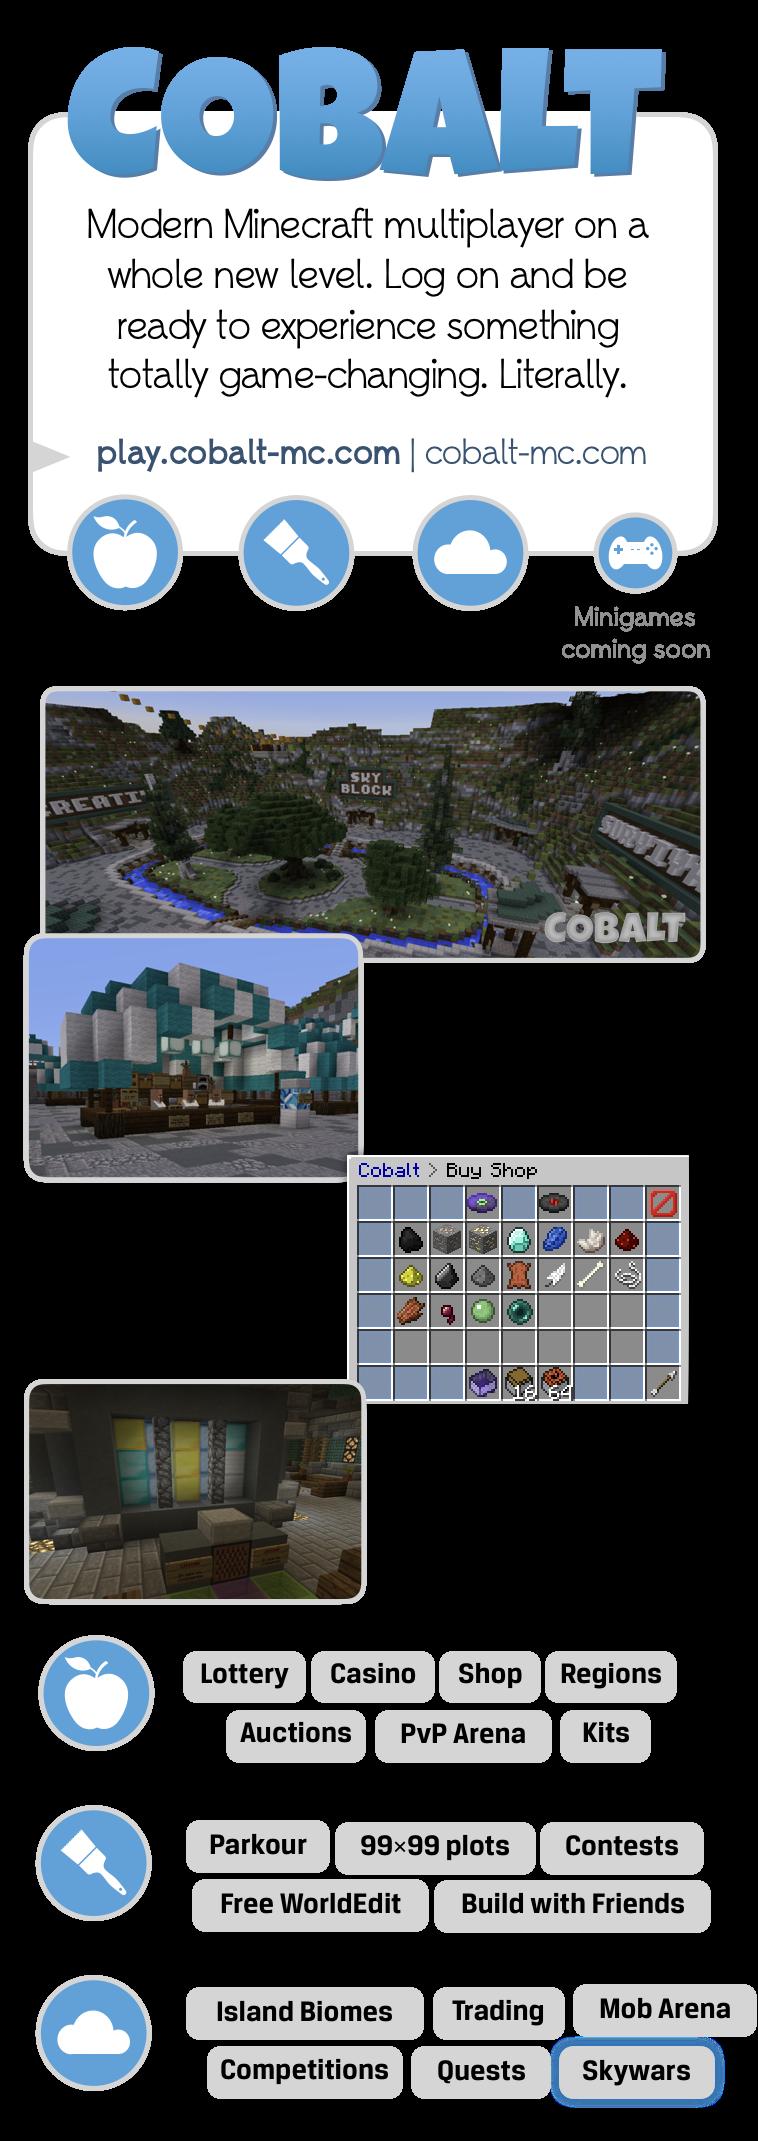 Cobalt Promotional Infographic